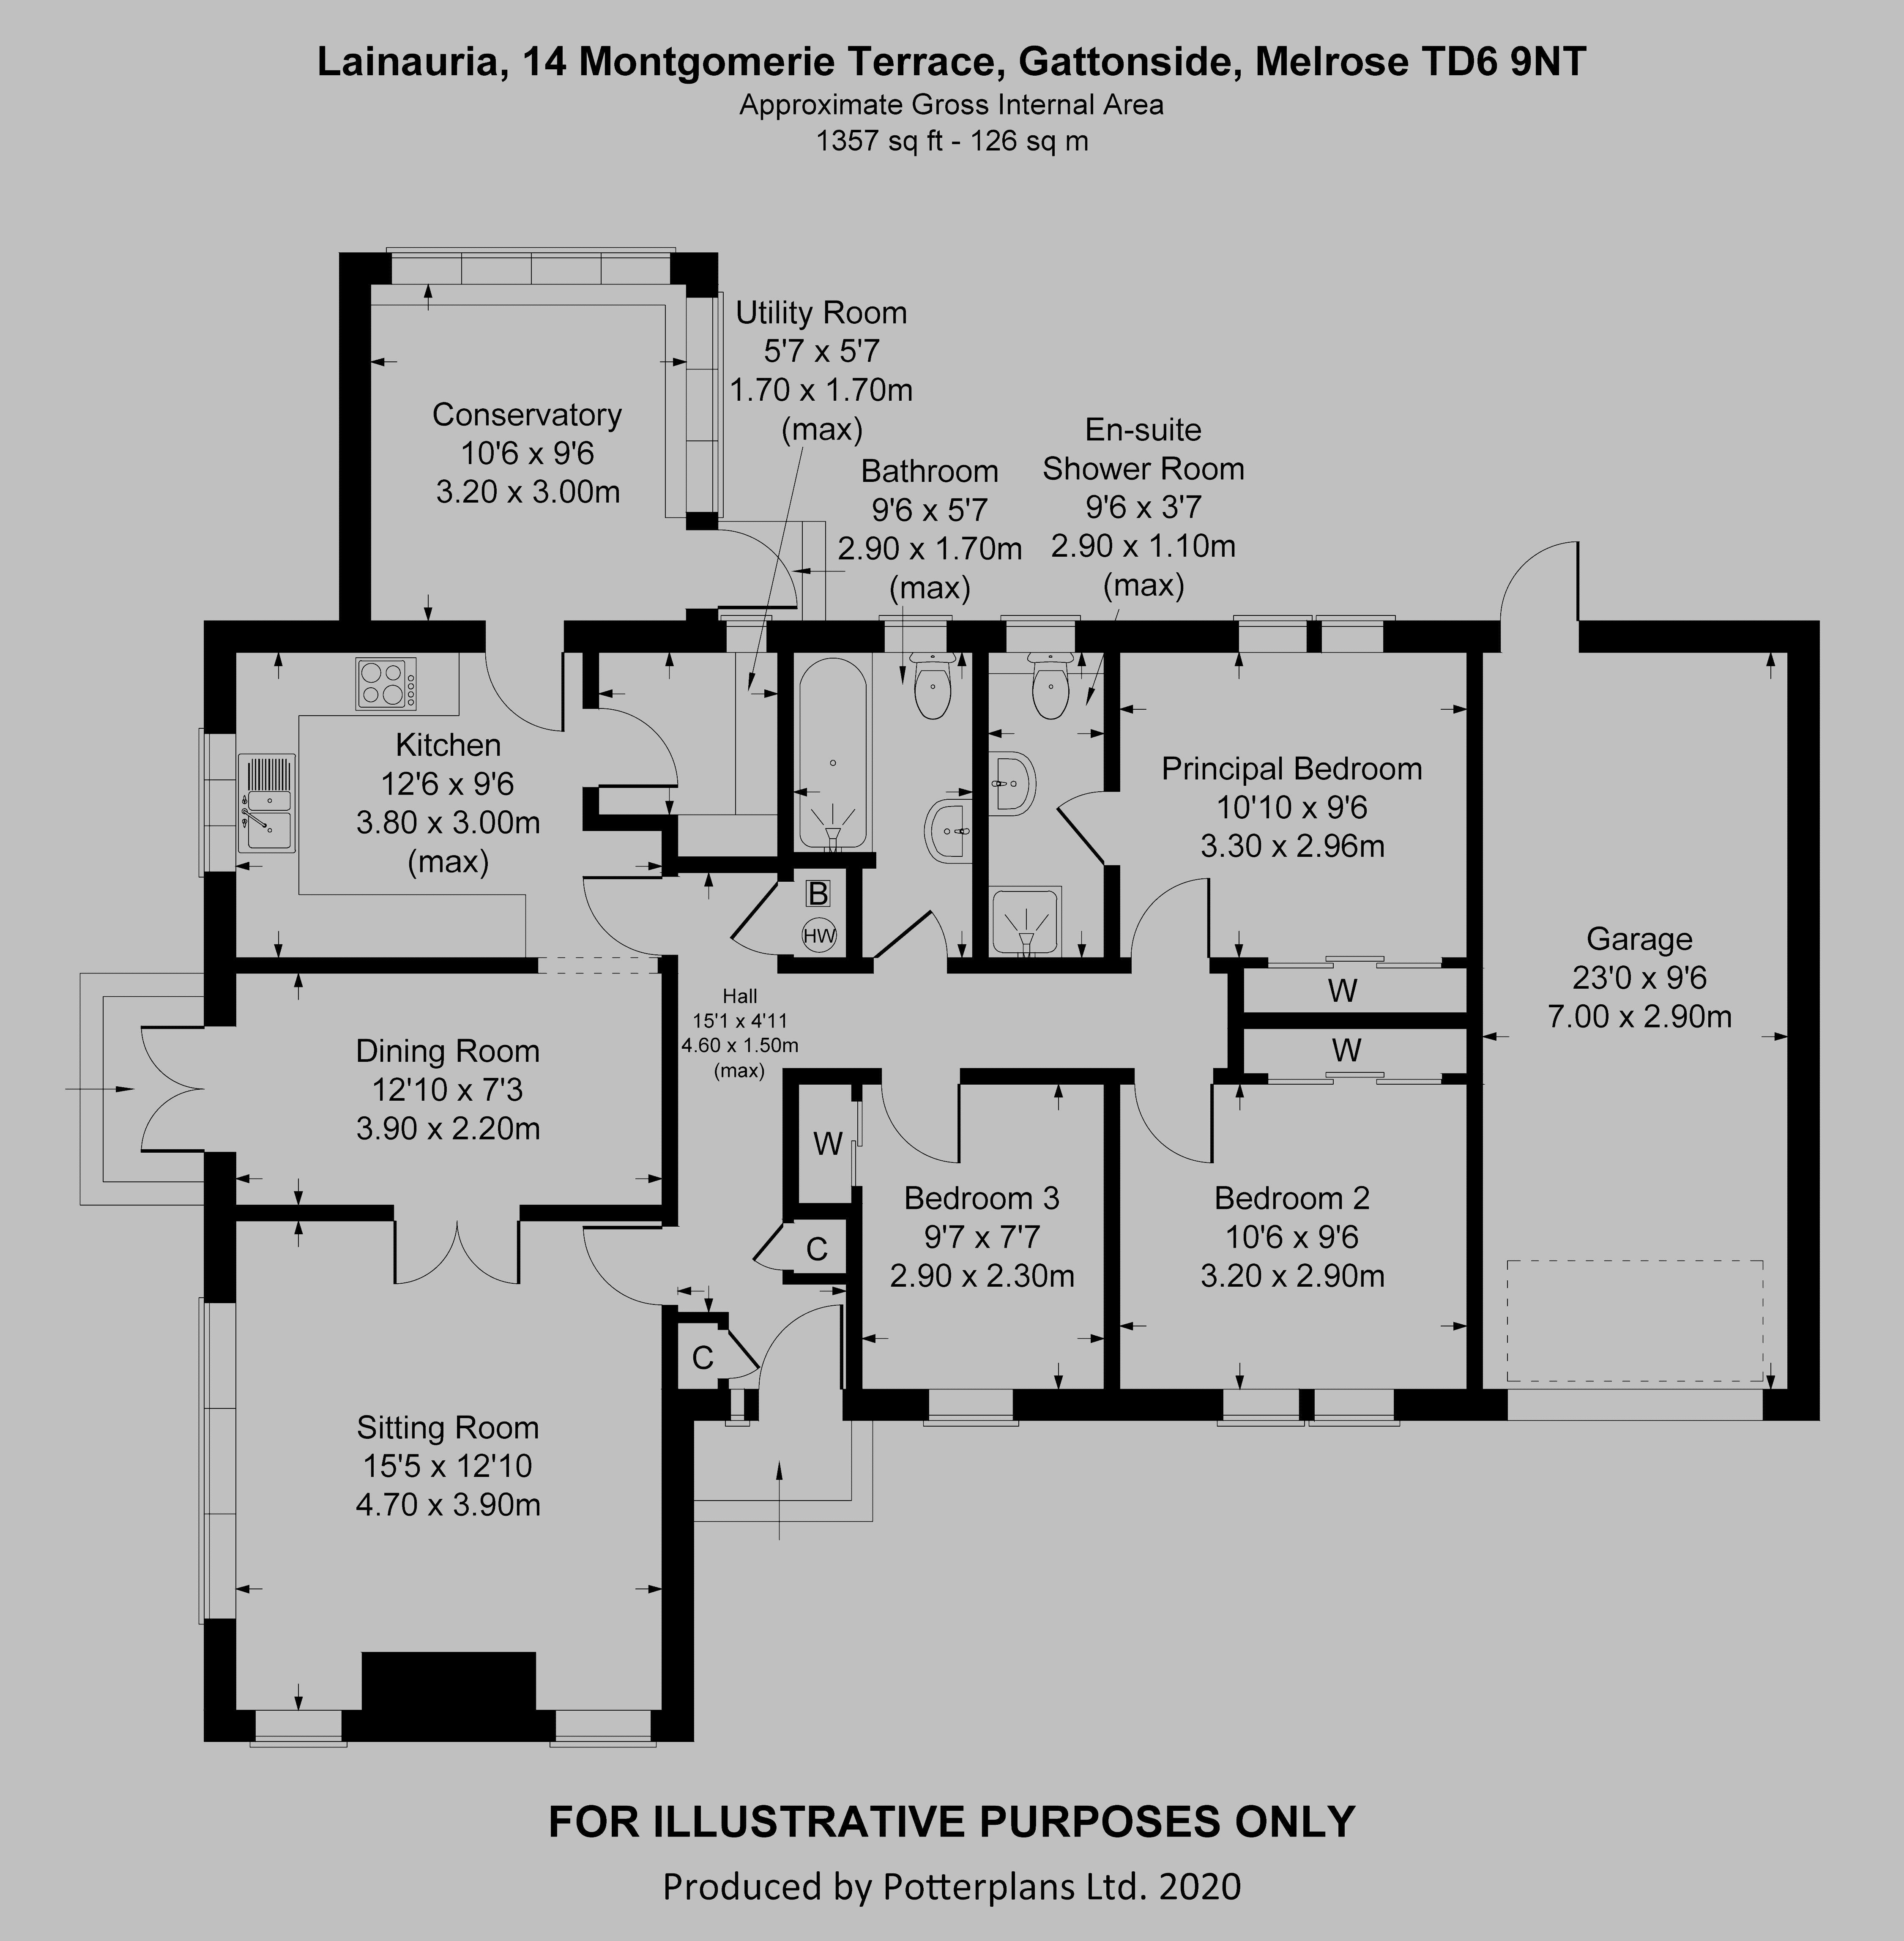 Lainauria, 14 Montgomerie Terrace Floorplan